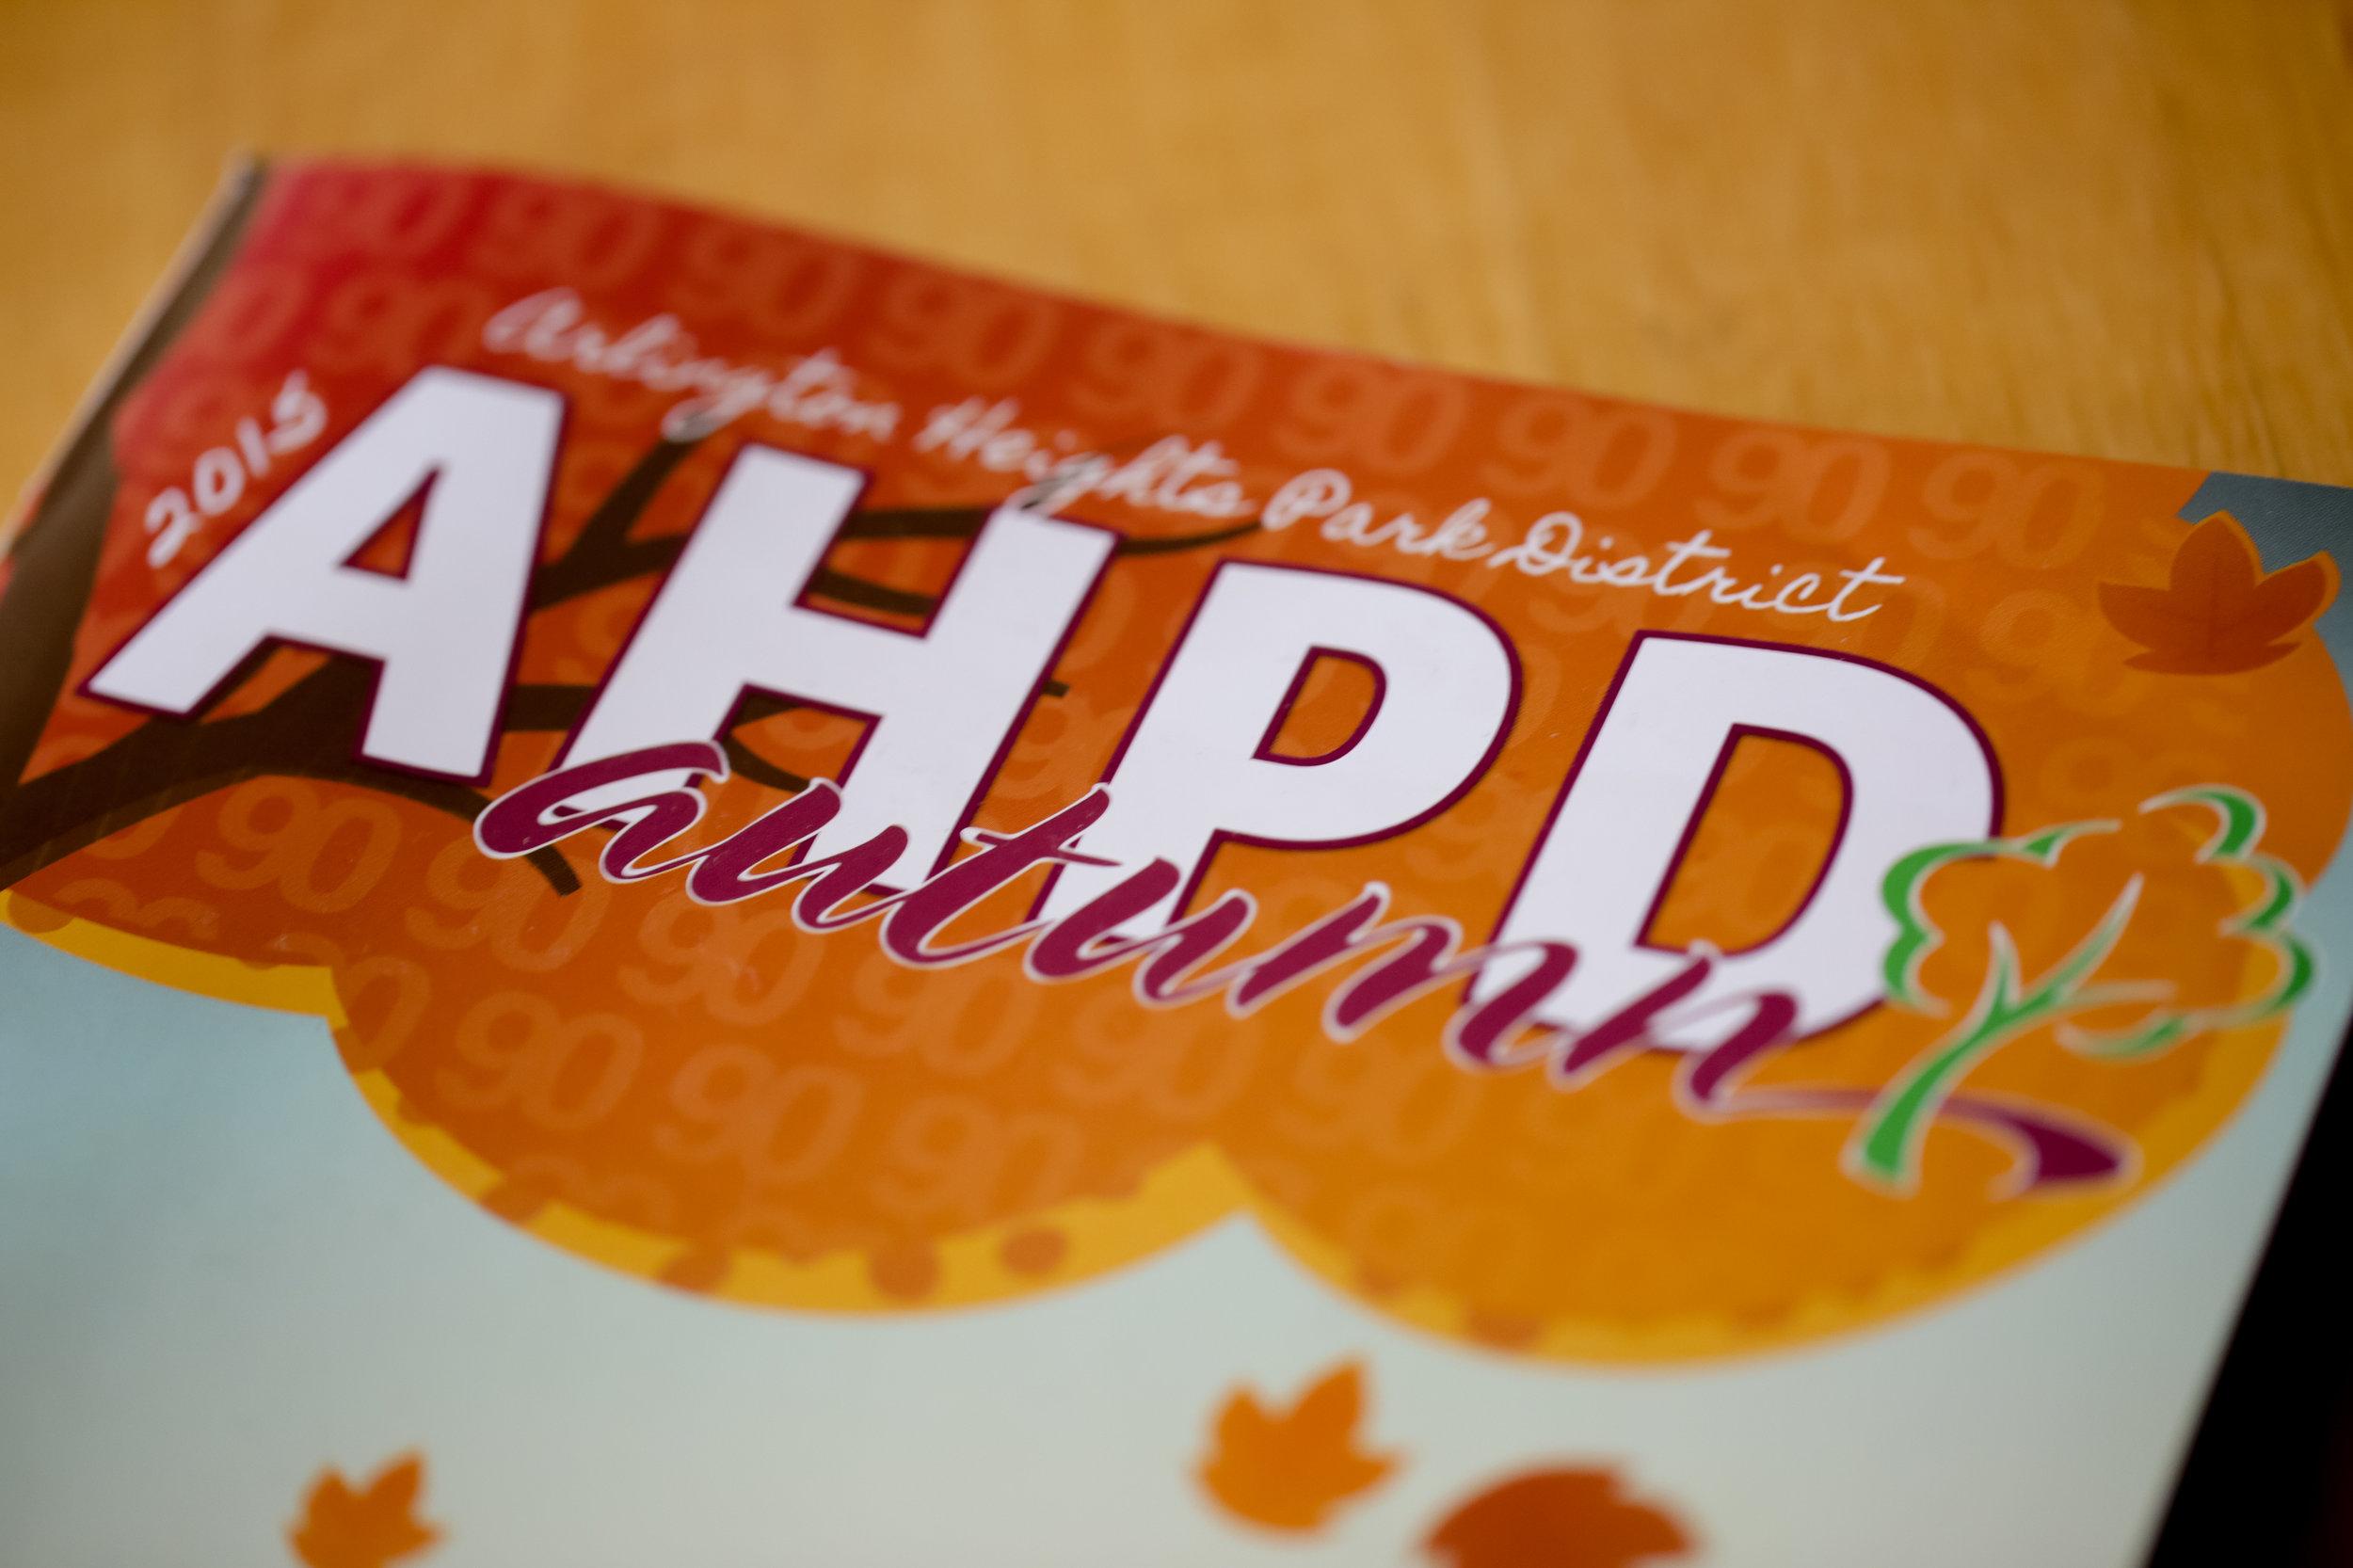 AHPD-421.jpg